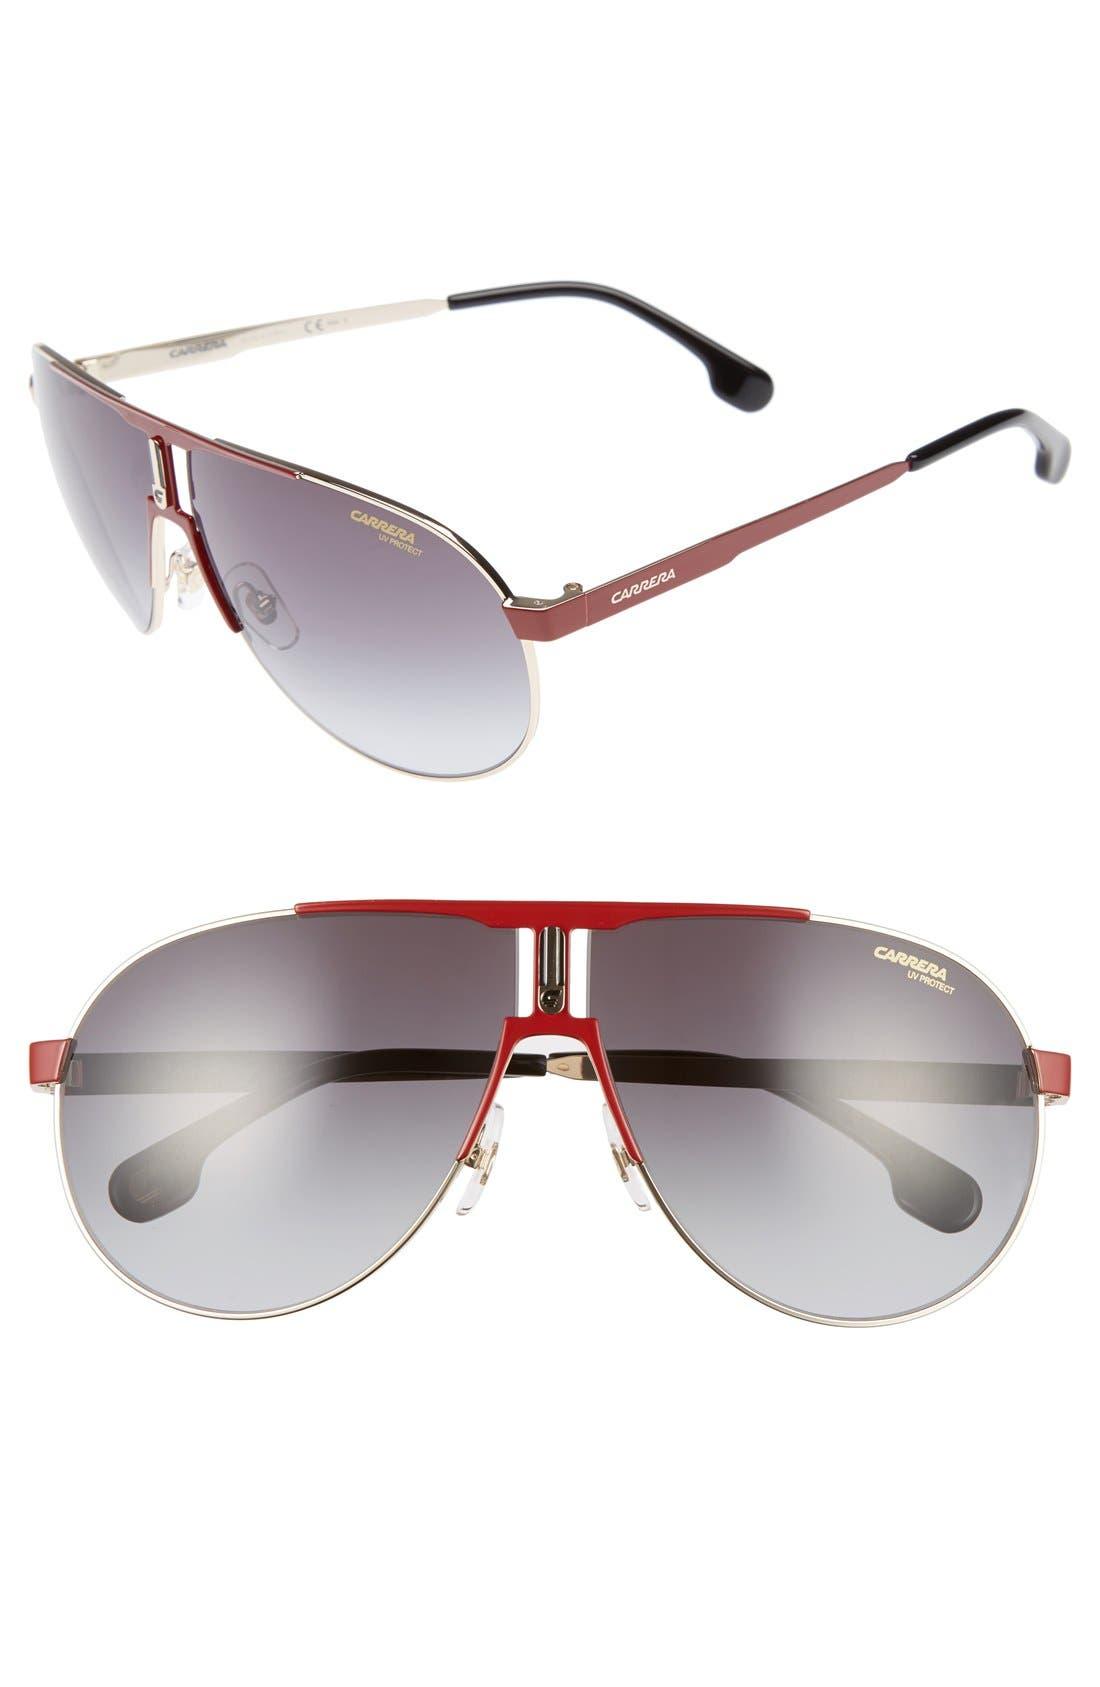 Carrera Eyewear 66mm Aviator Sunglasses